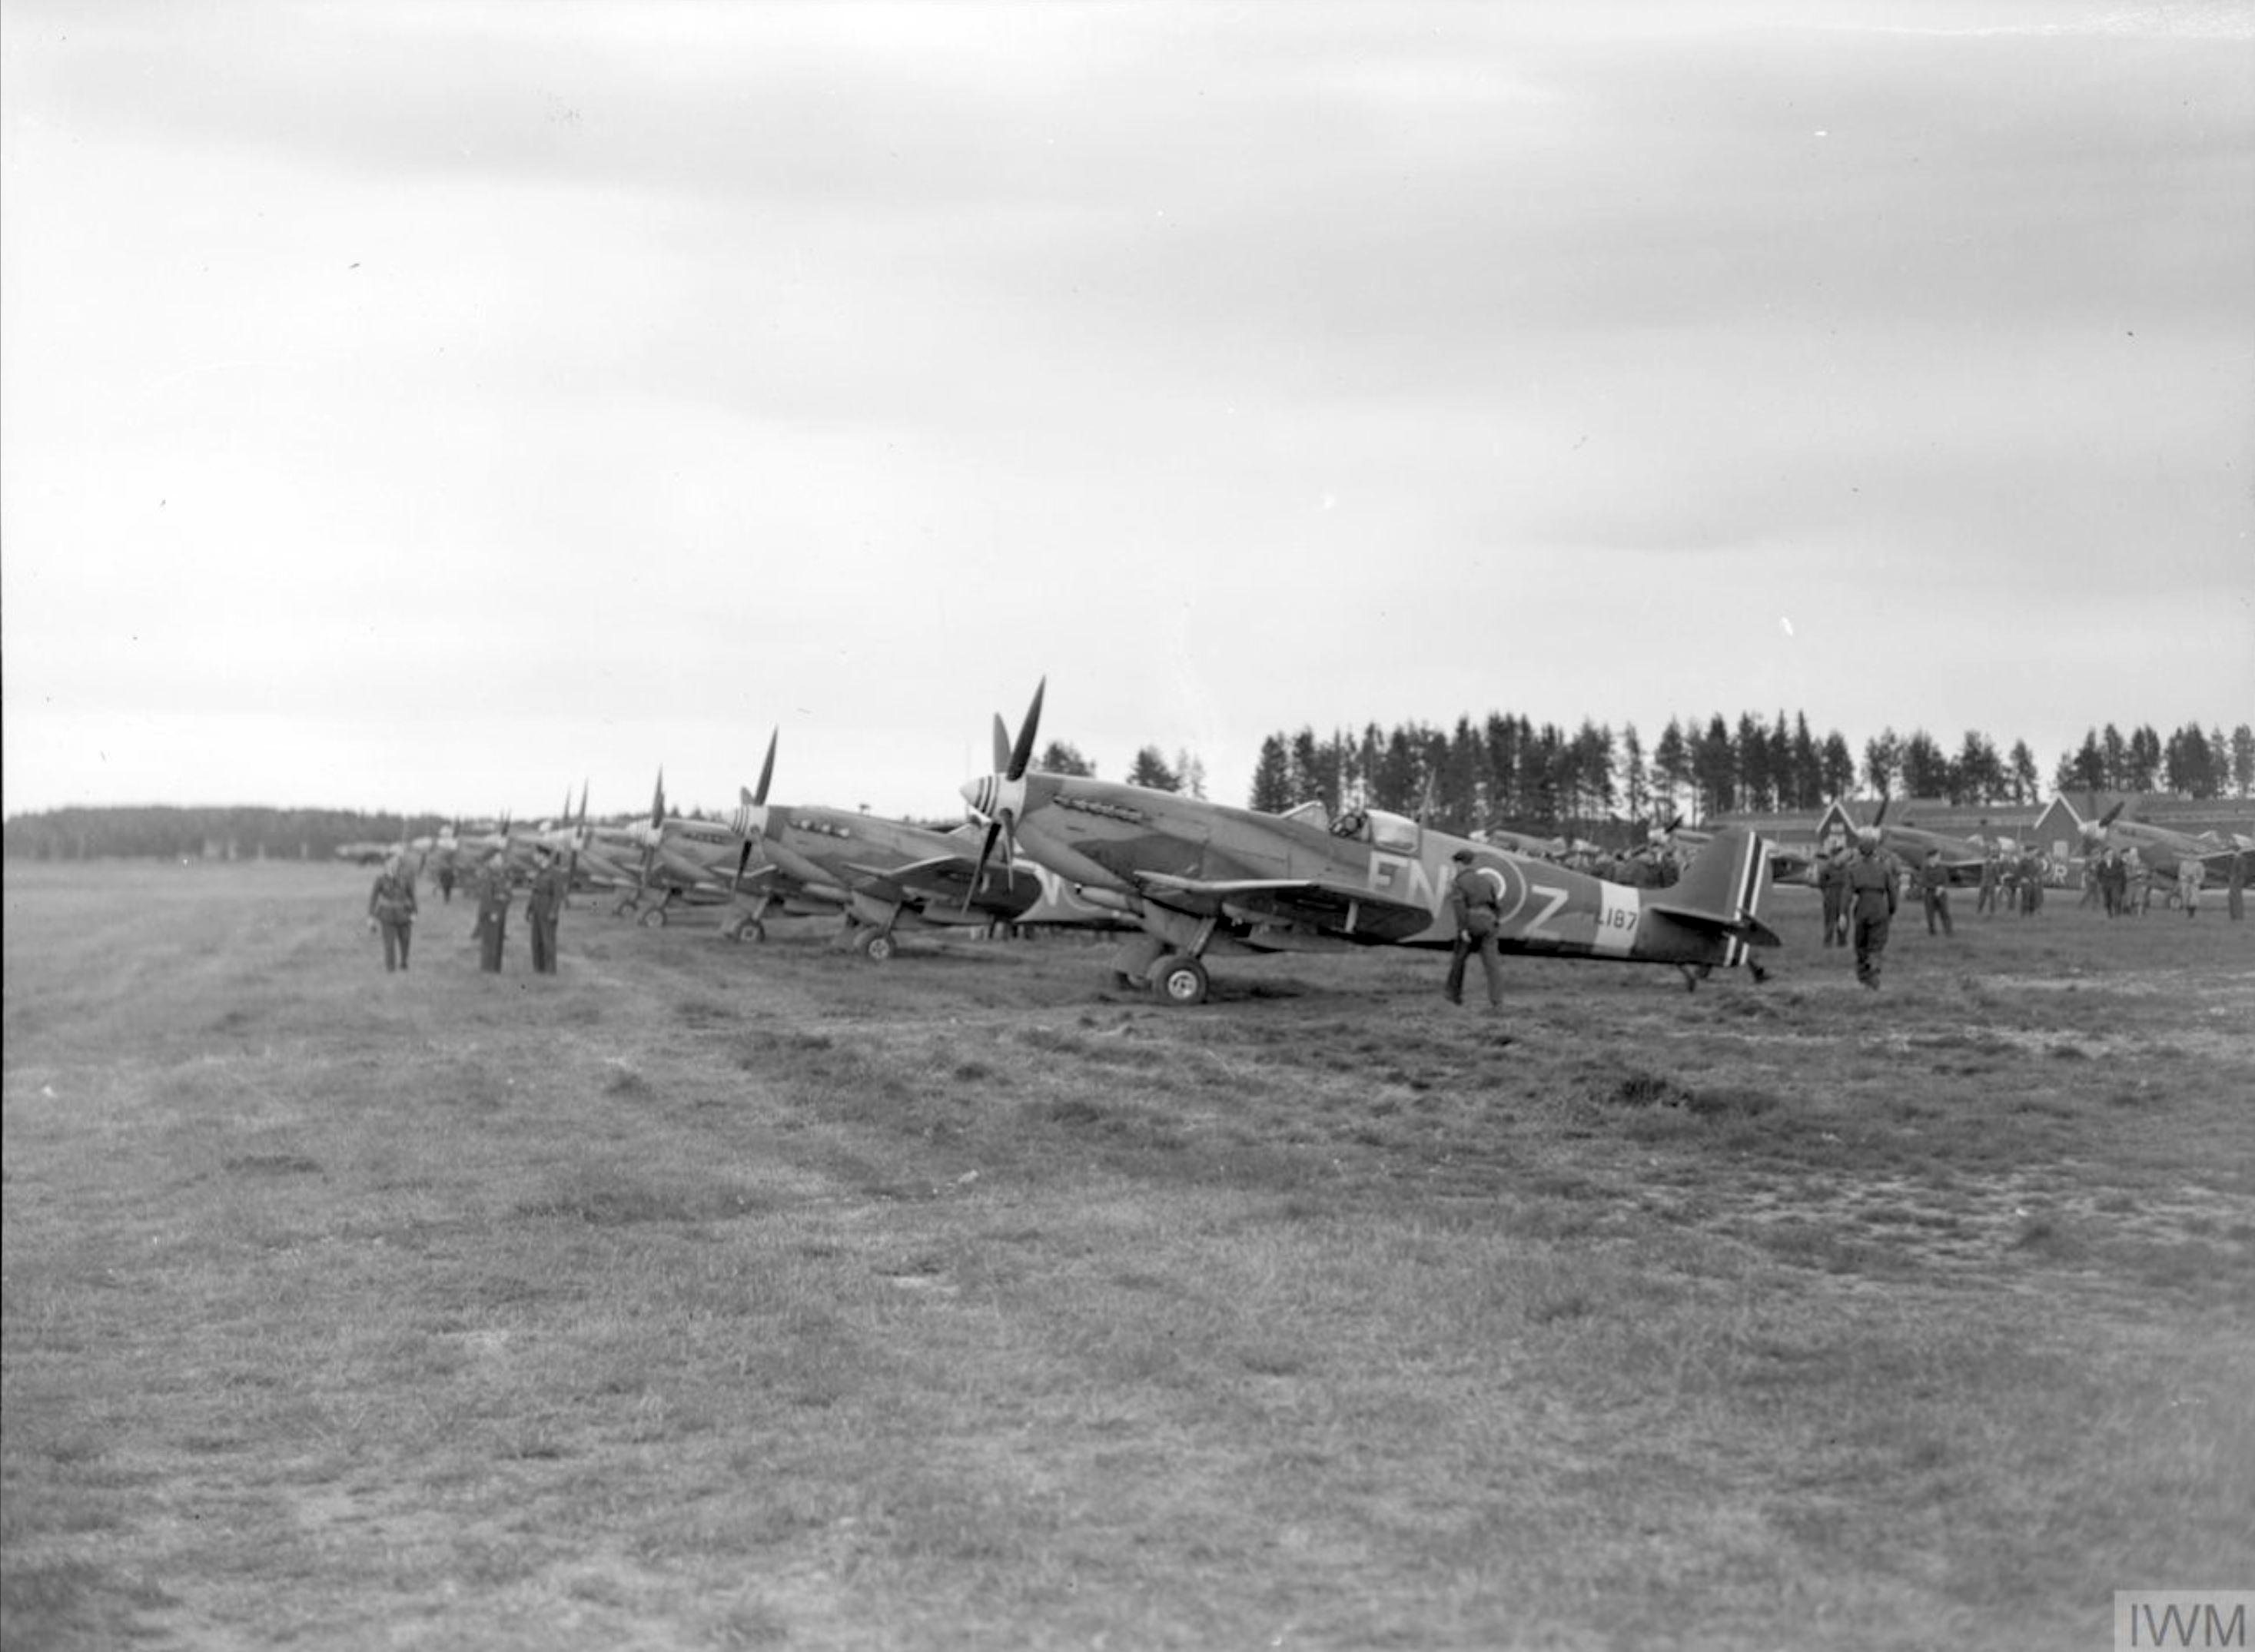 Spitfire MkIXe RAF 331Sqn FNZ PL187 at Gardermoen nr Oslo IWM CL2819